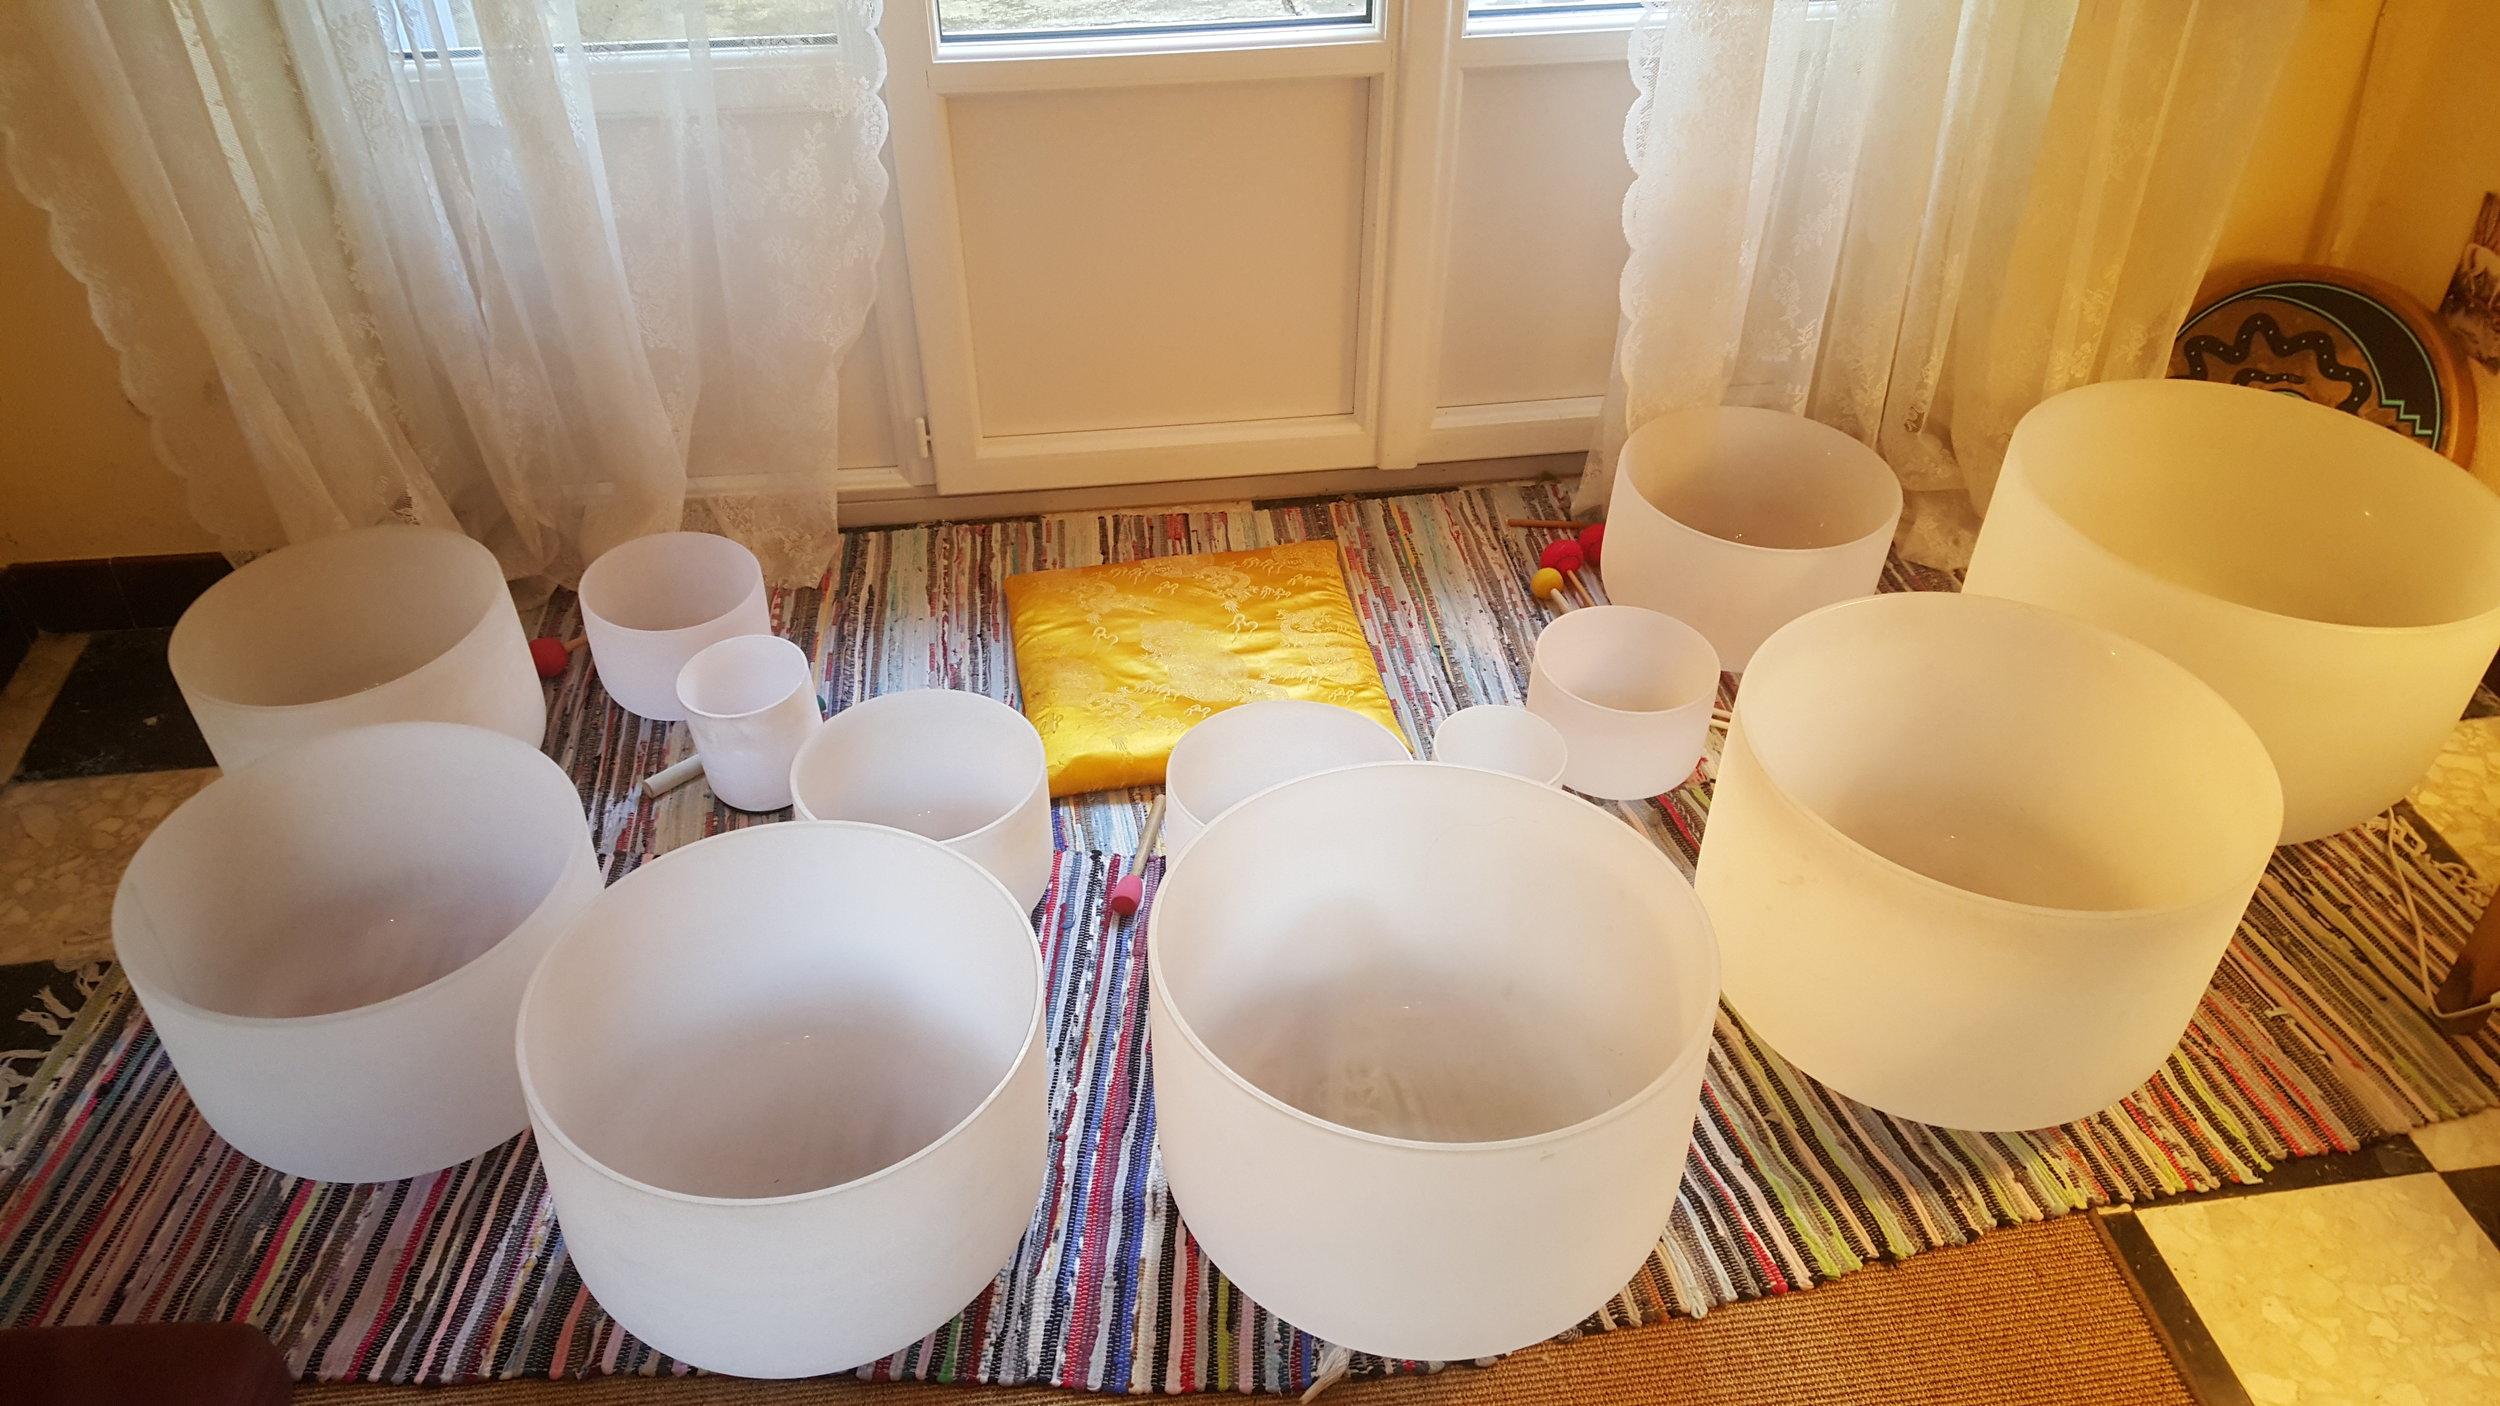 bowls 9 (1).jpeg